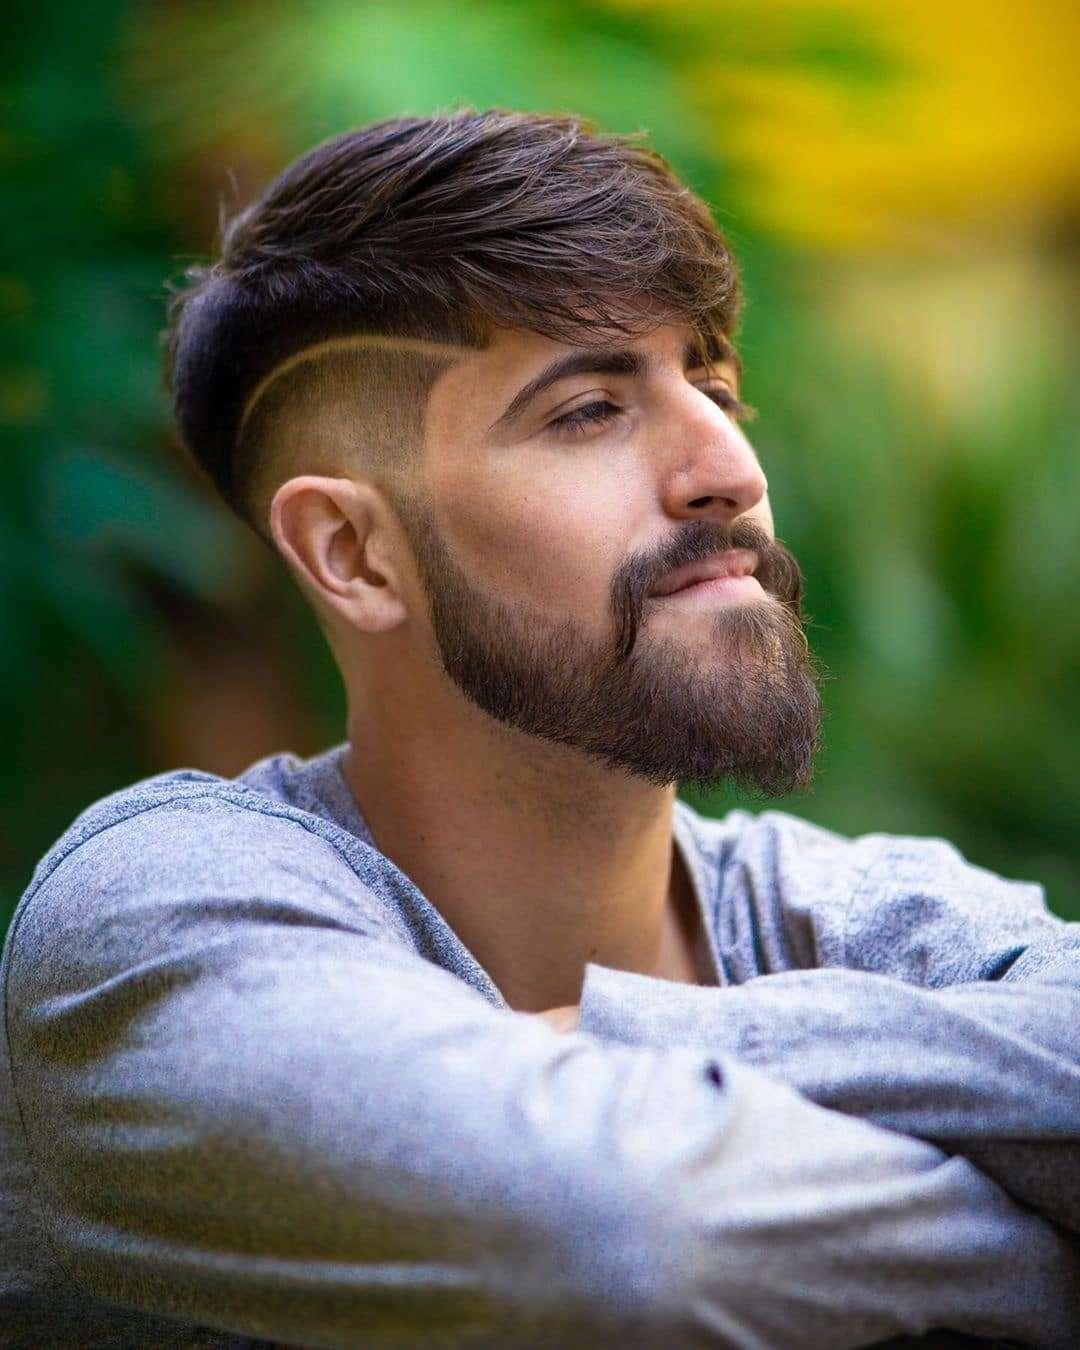 Fryzura na bok z brodą